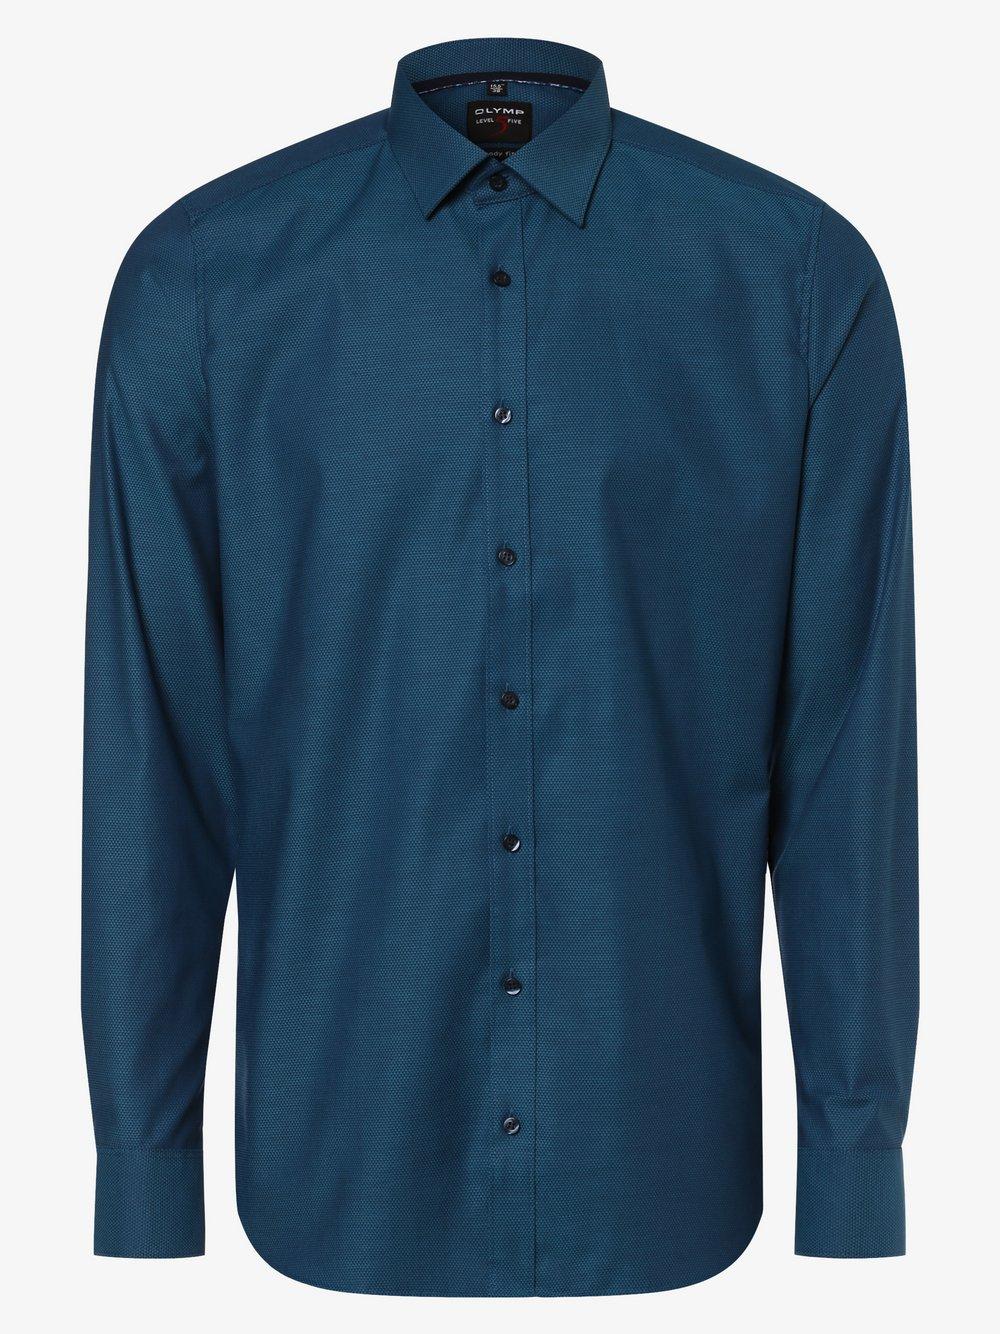 Olymp Level Five – Koszula męska, niebieski Van Graaf 460050-0002